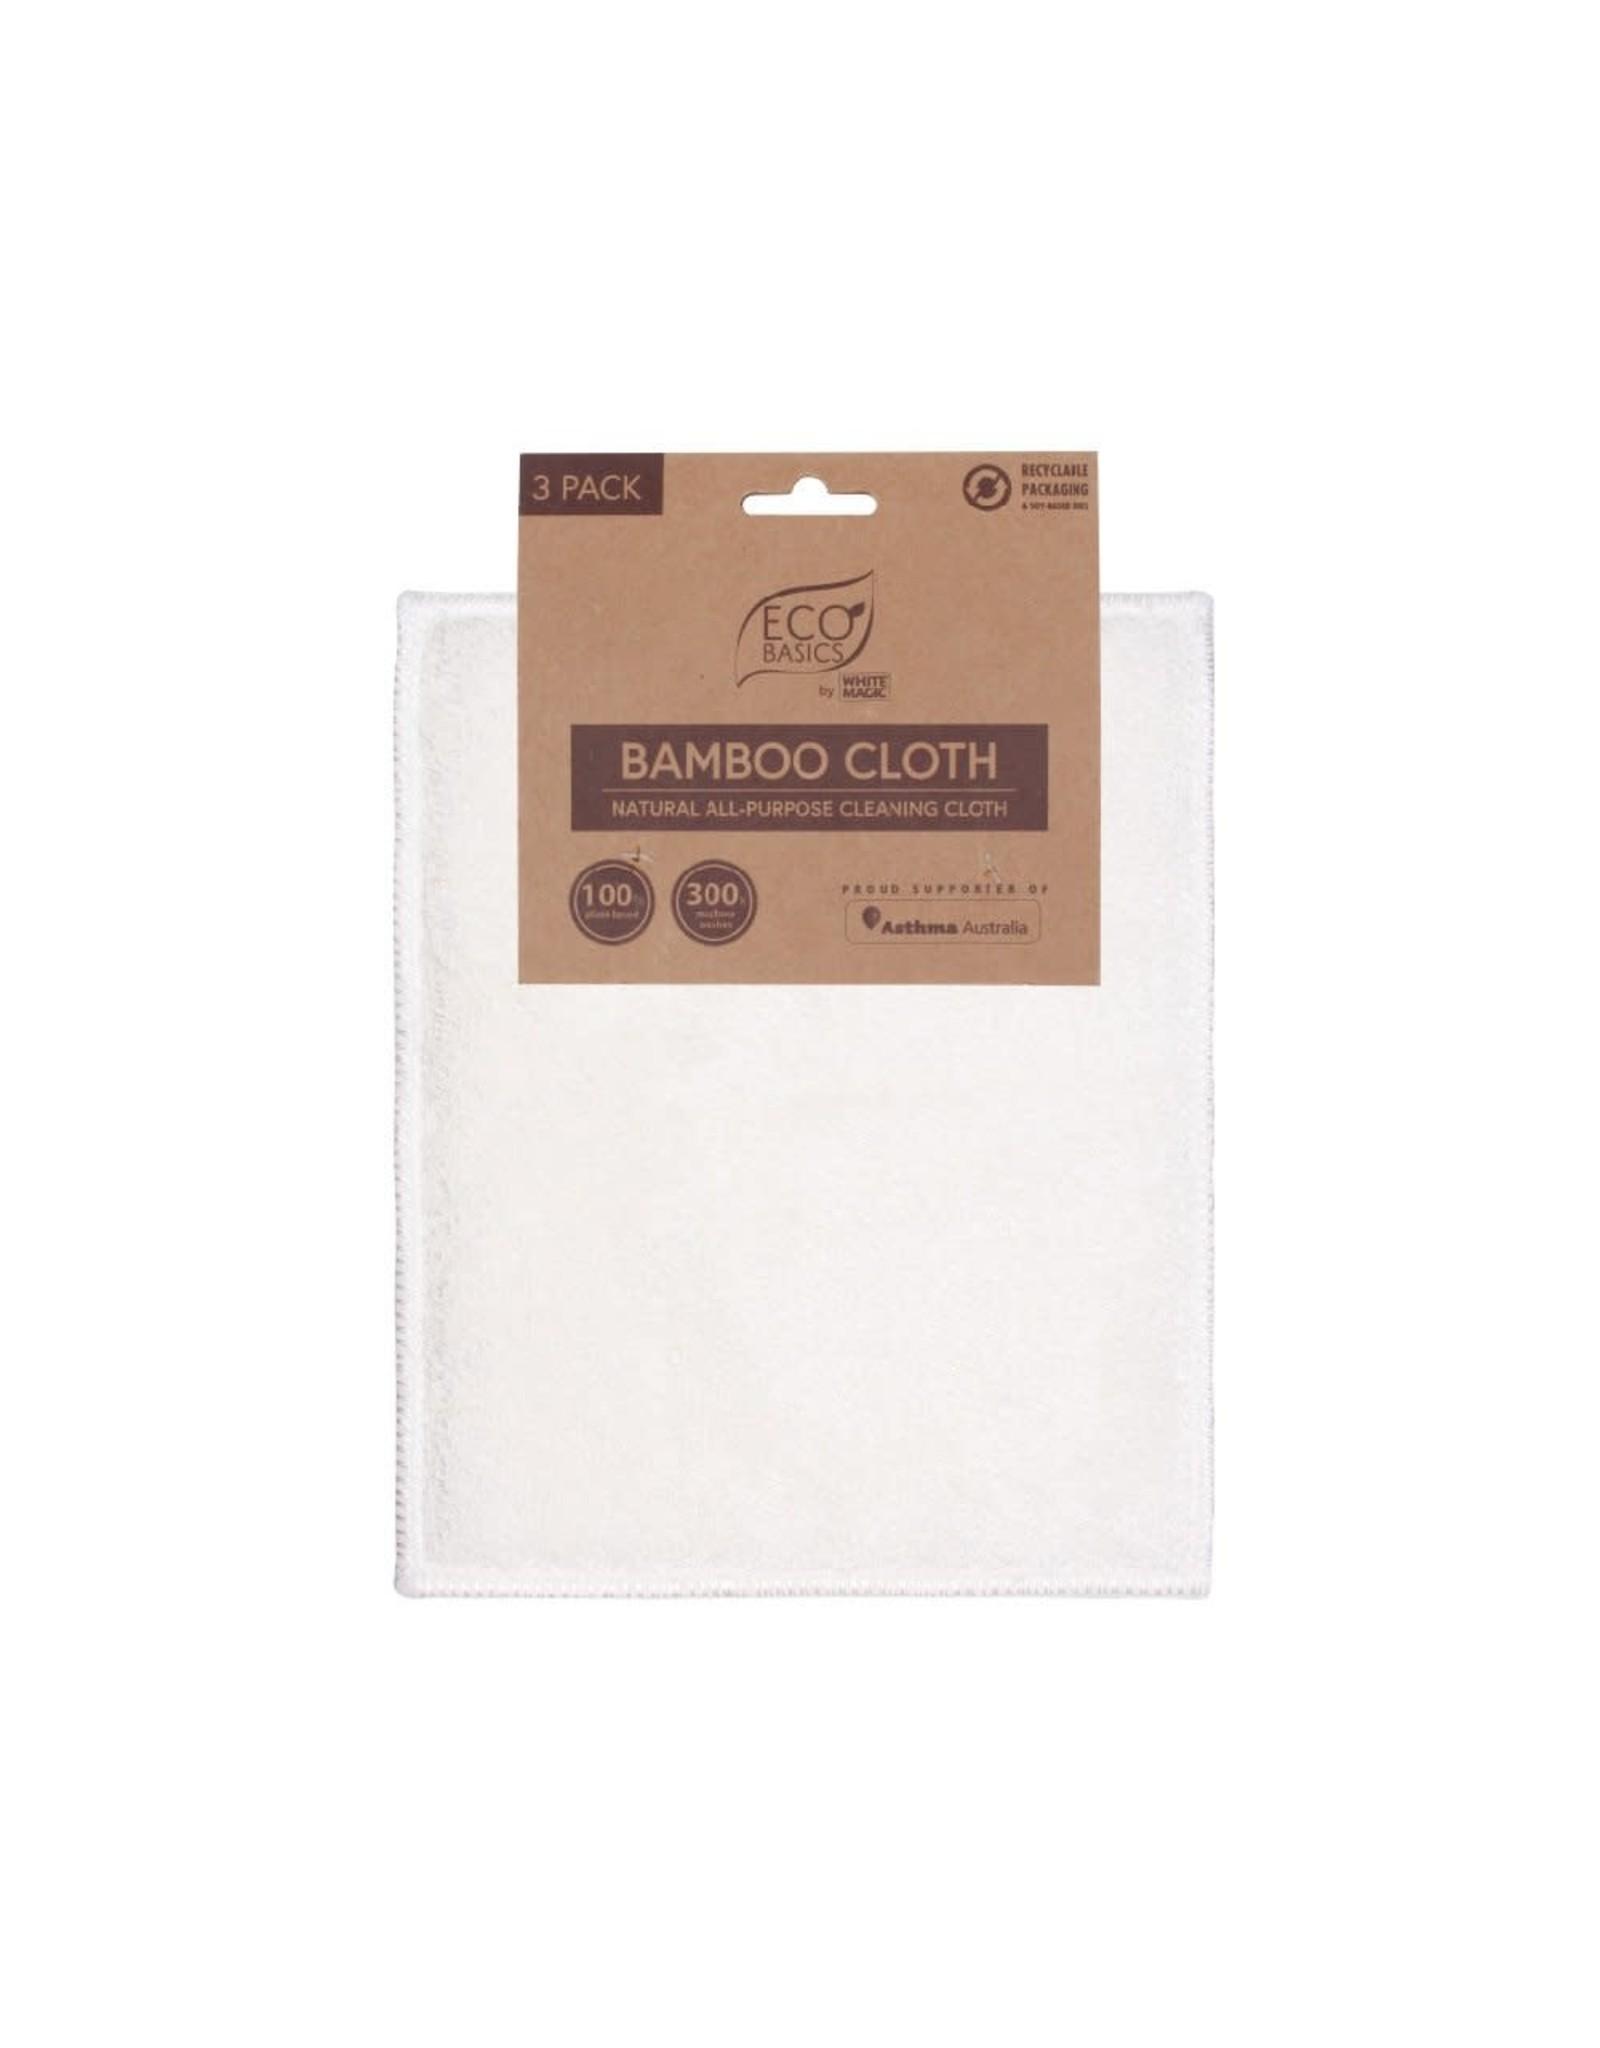 White Magic Bamboo Cloth 3pk